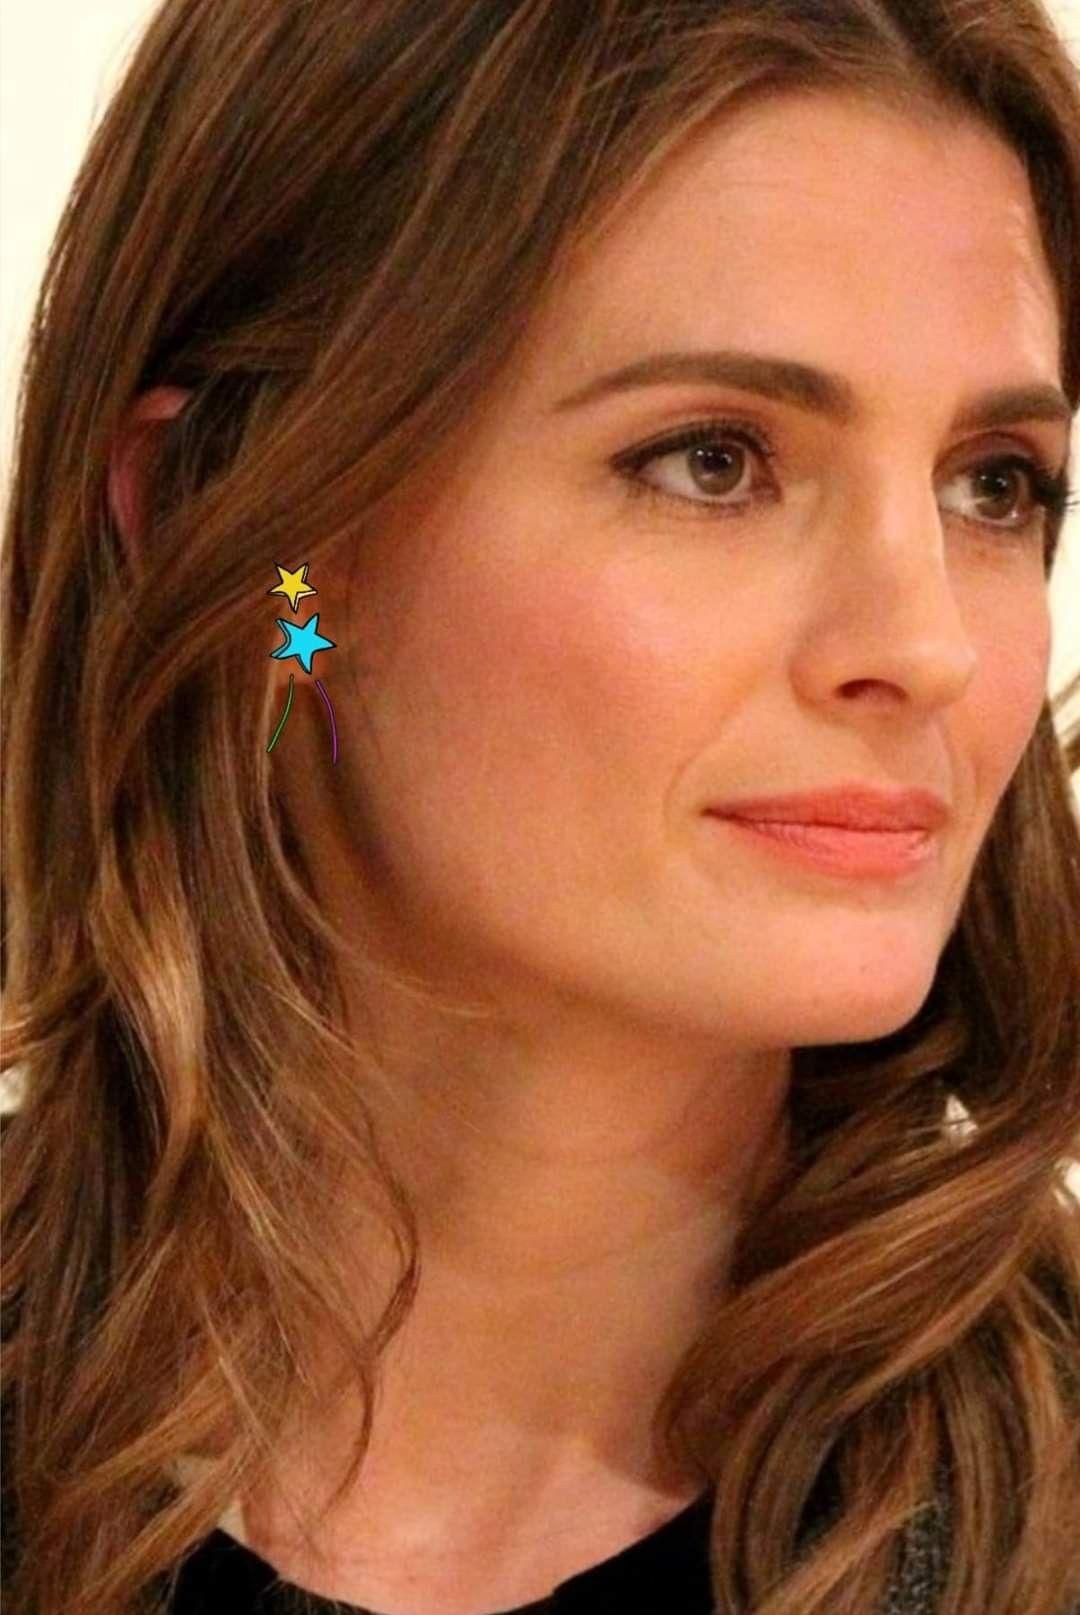 Pin By Maria Teresa On 1 Stana K In 2021 Stana Katic True Beauty Kate Beckett